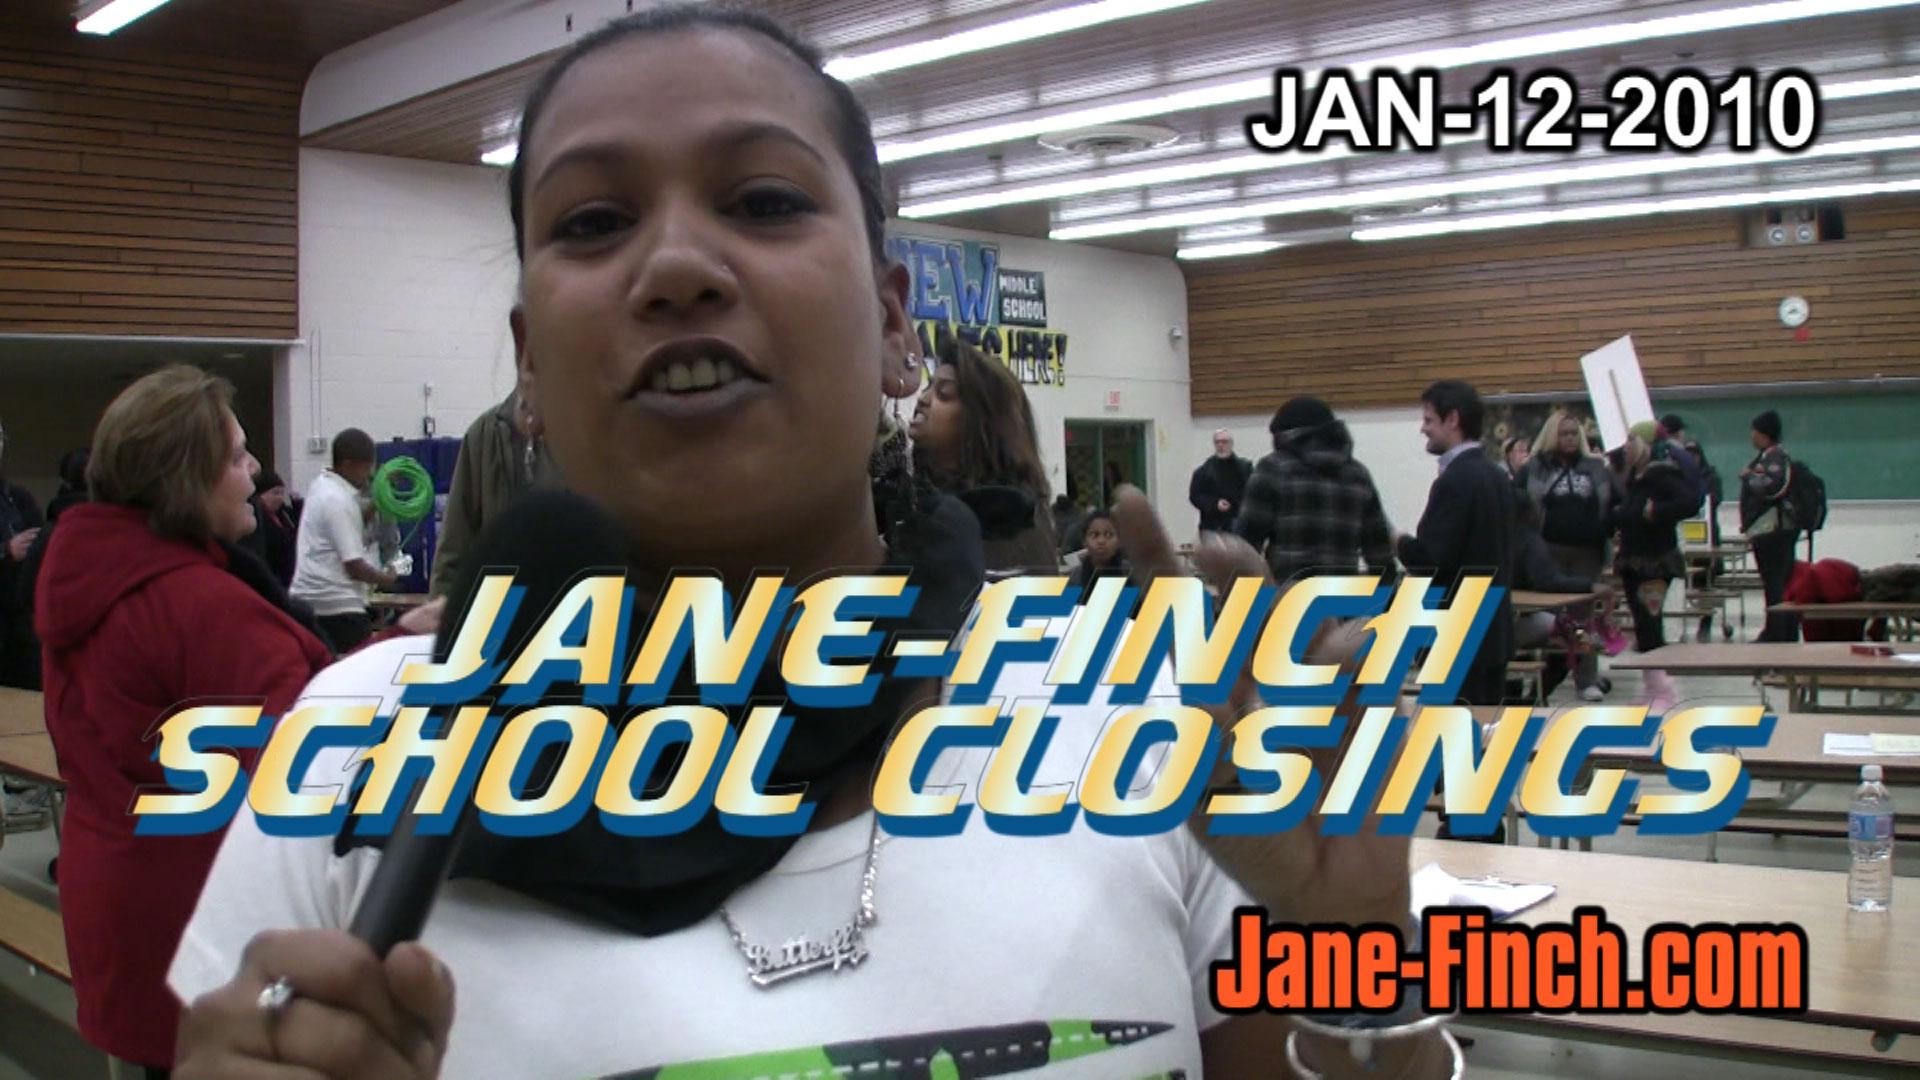 School Closures Toronto: Jane-Finch School Closings